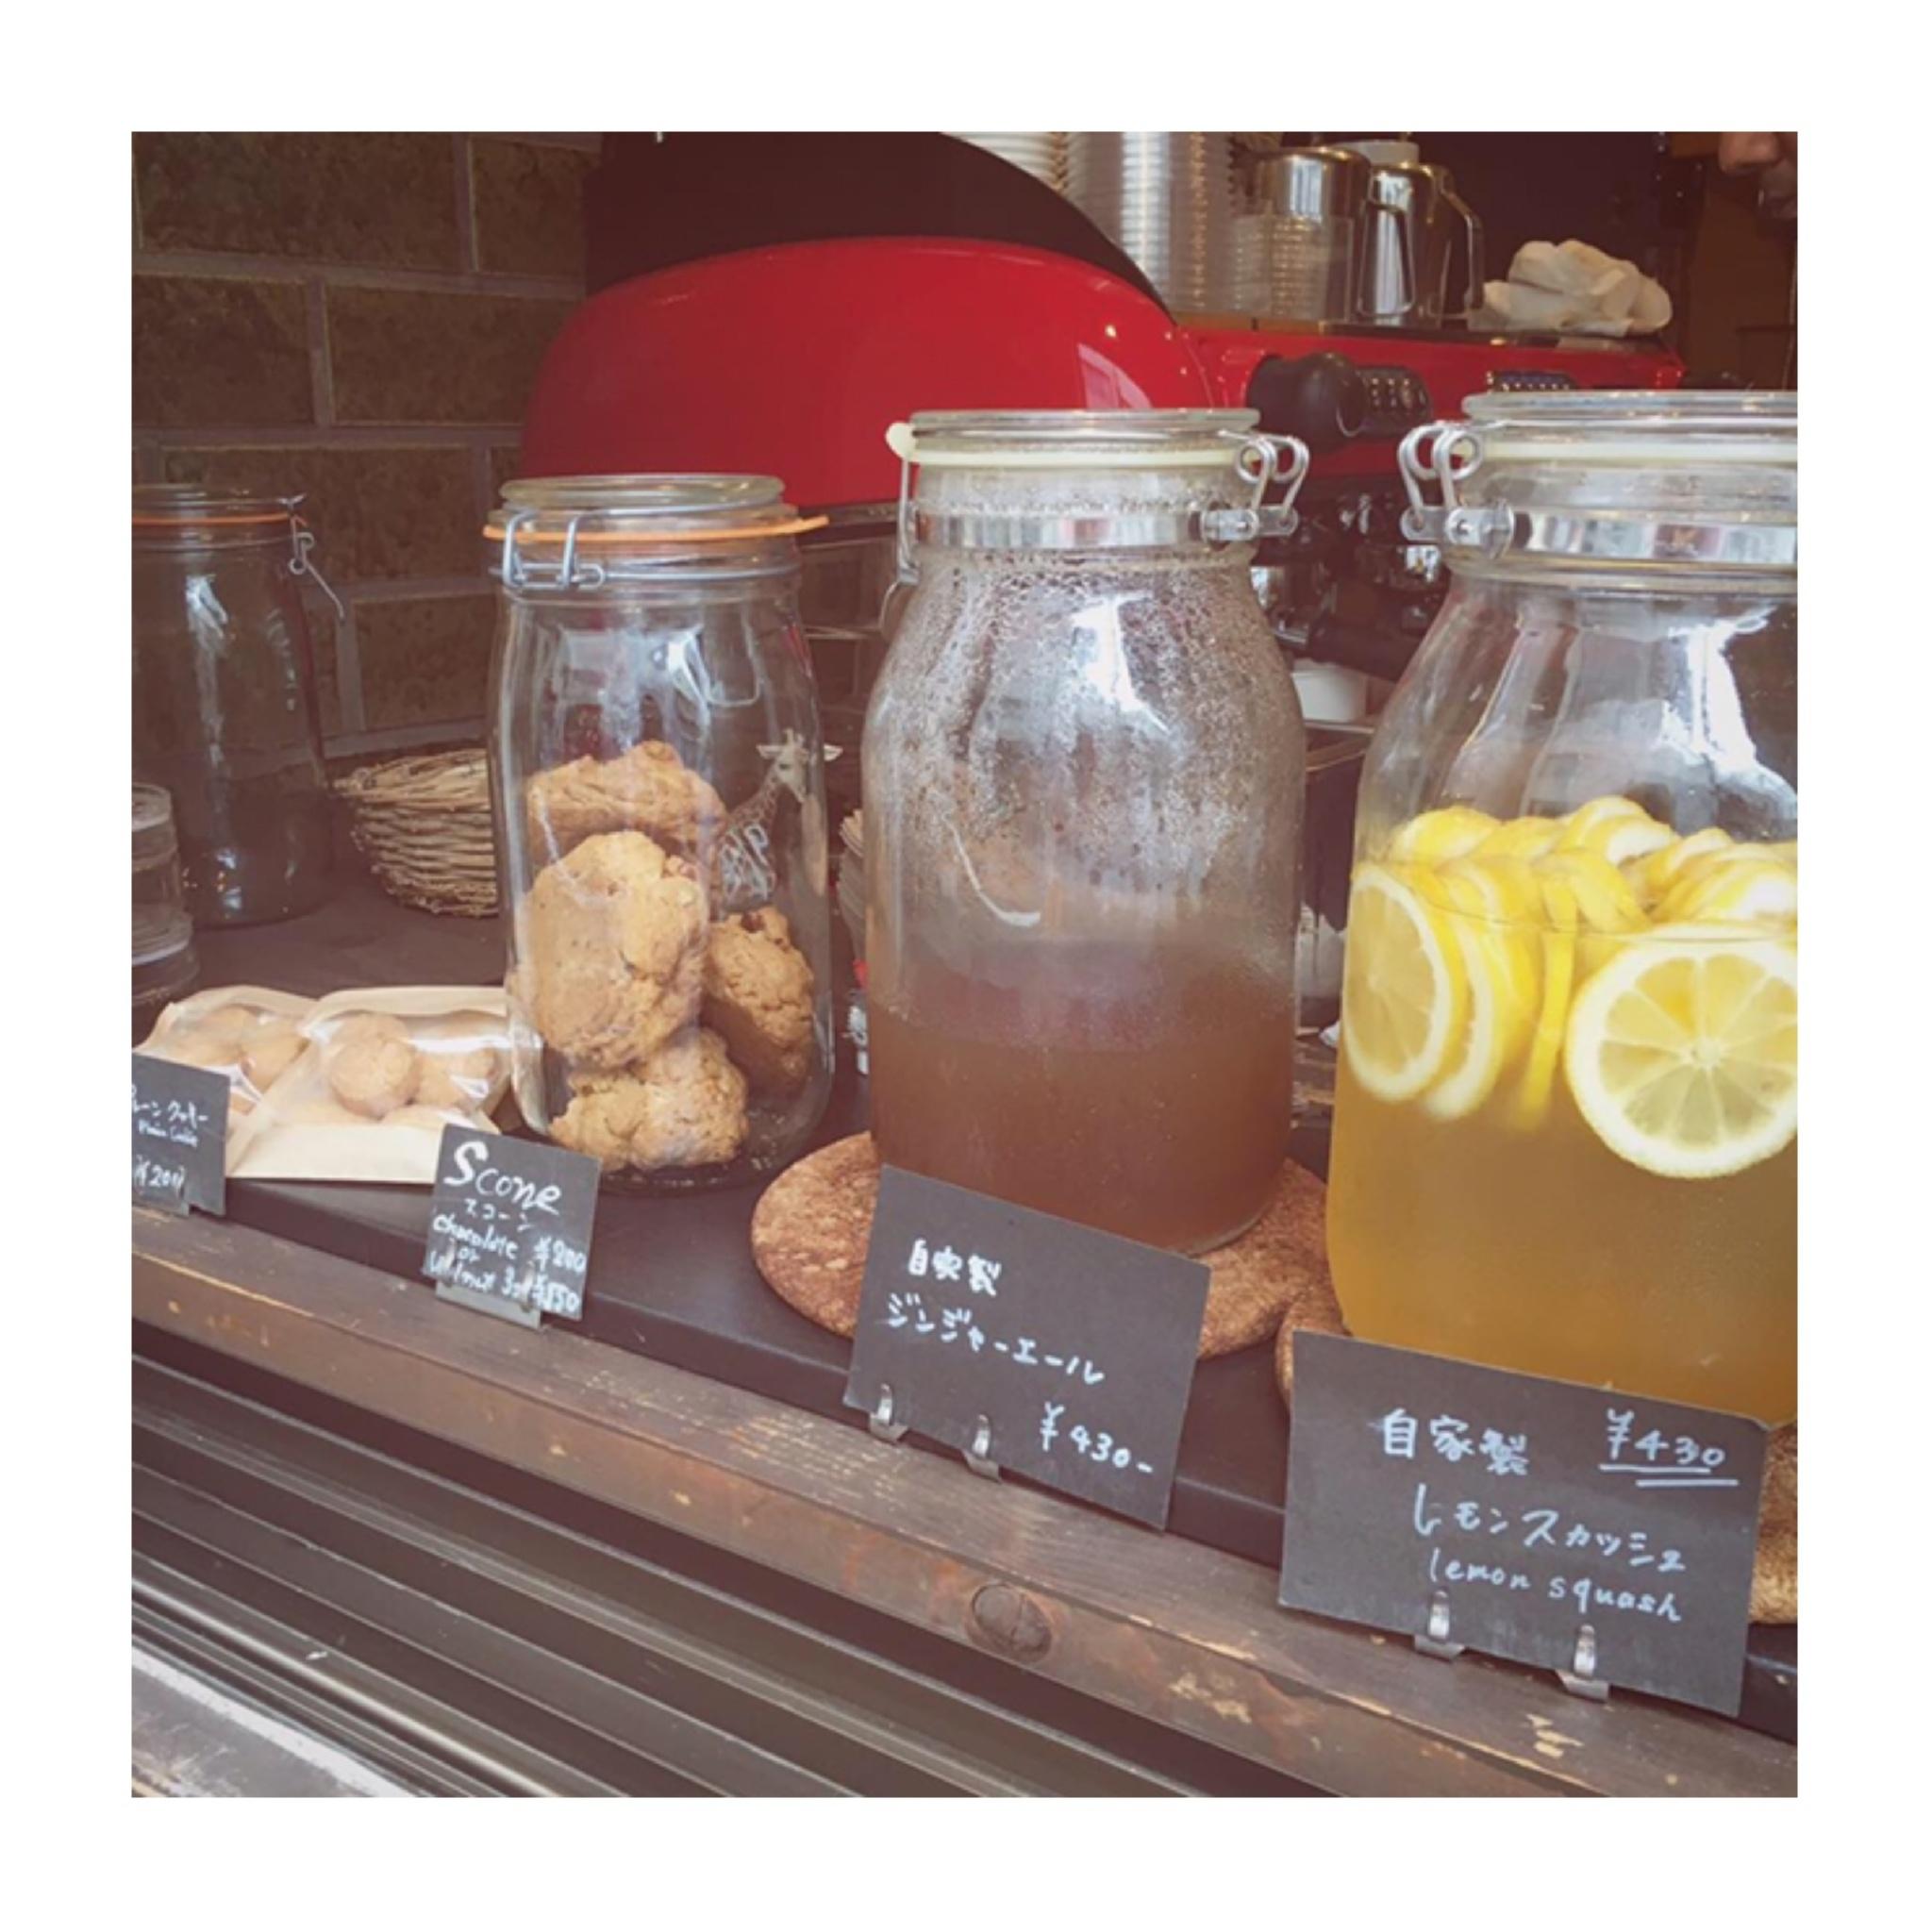 #15【#cafestagram】❤️:《東京•蔵前》身体にやさしいコーヒーを飲みに『SOL'S COFFEE』へ☻_4